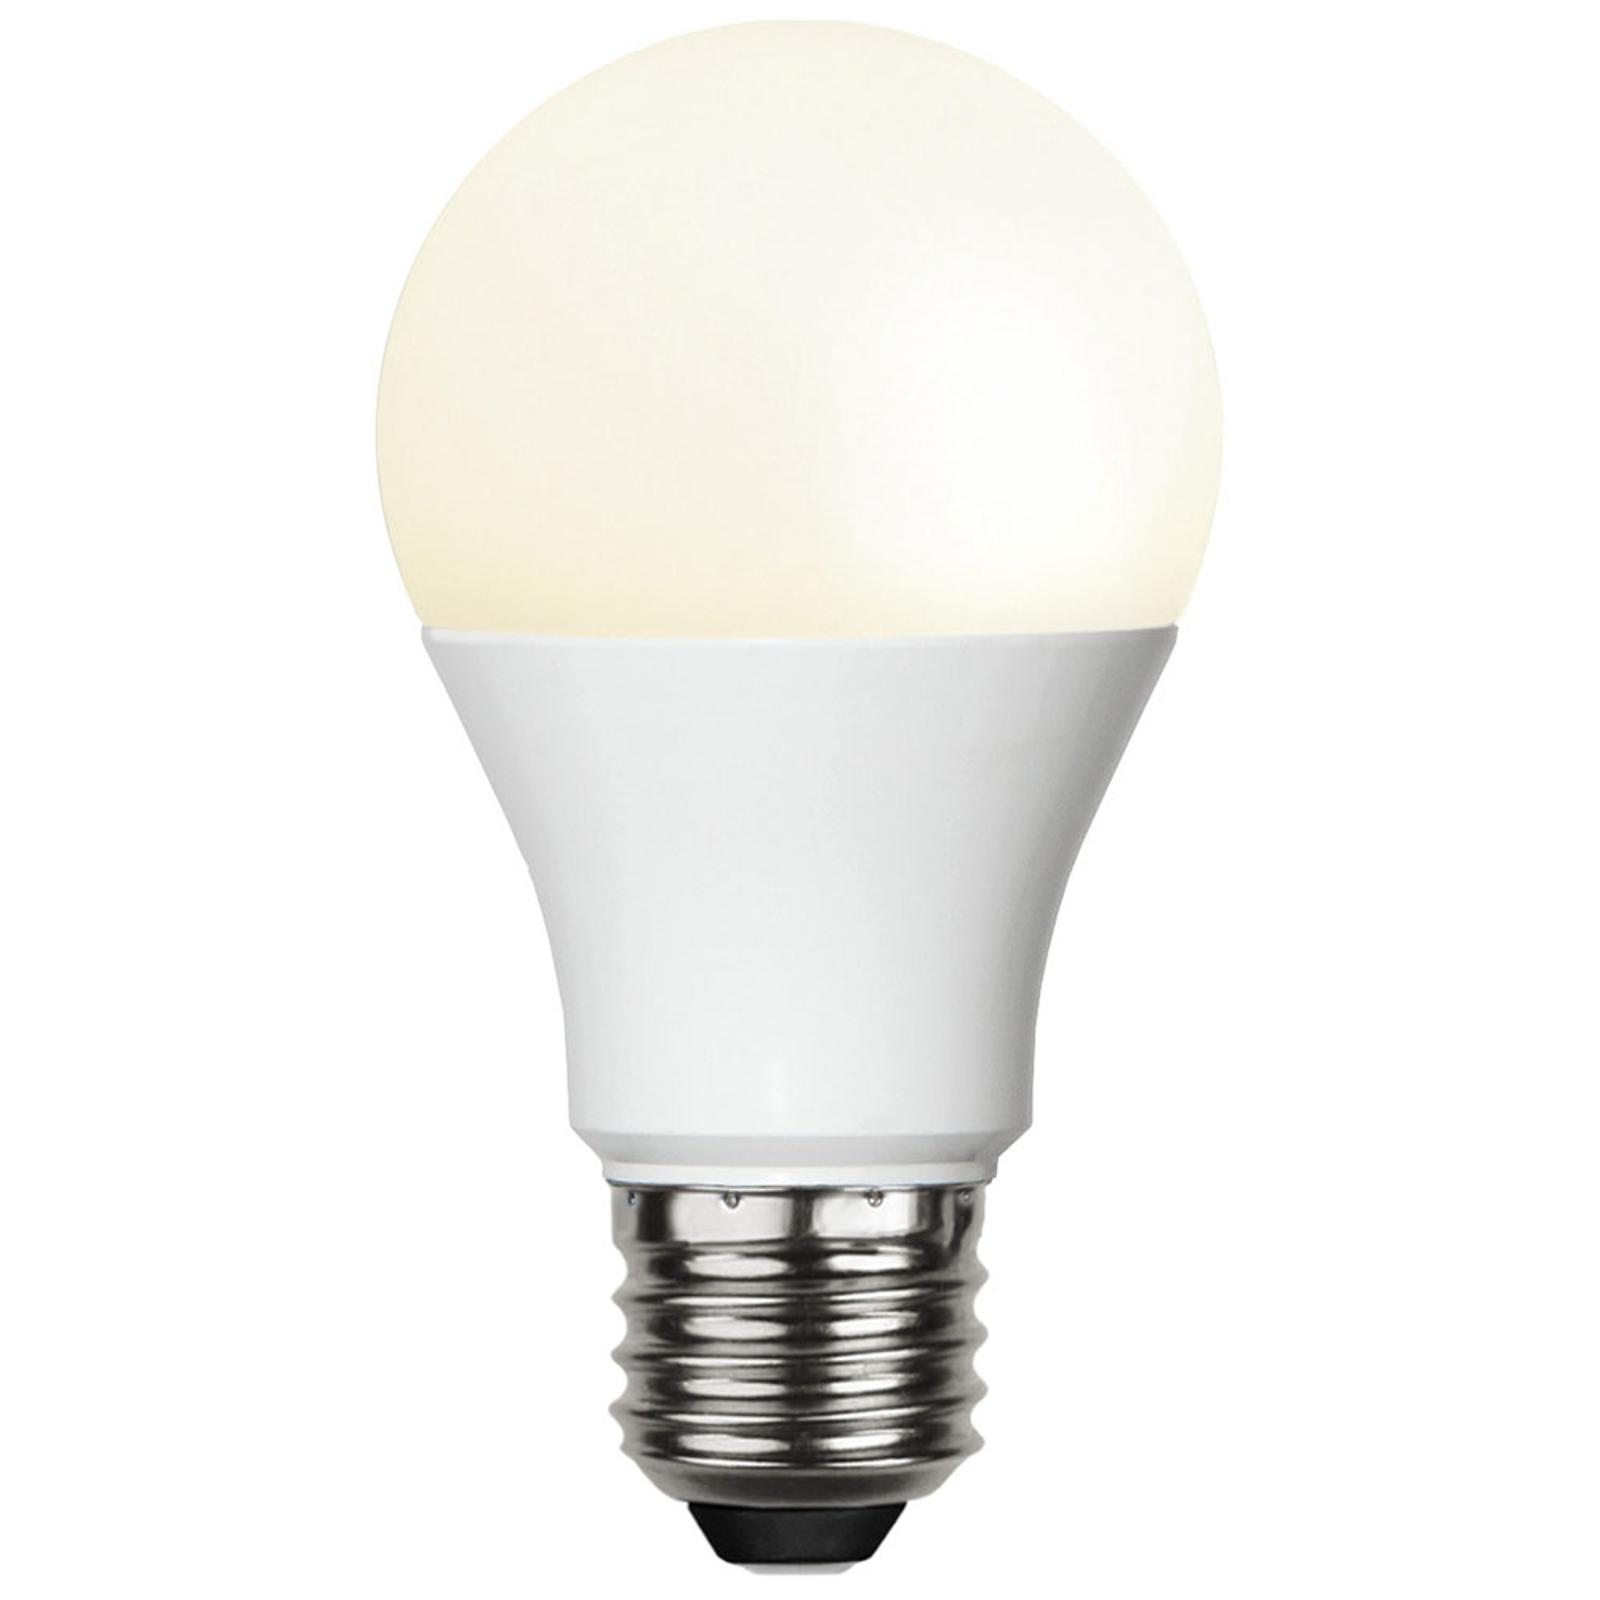 LED-Lampe E27 A60 4,5W hitzebeständig 470lm 2.700K